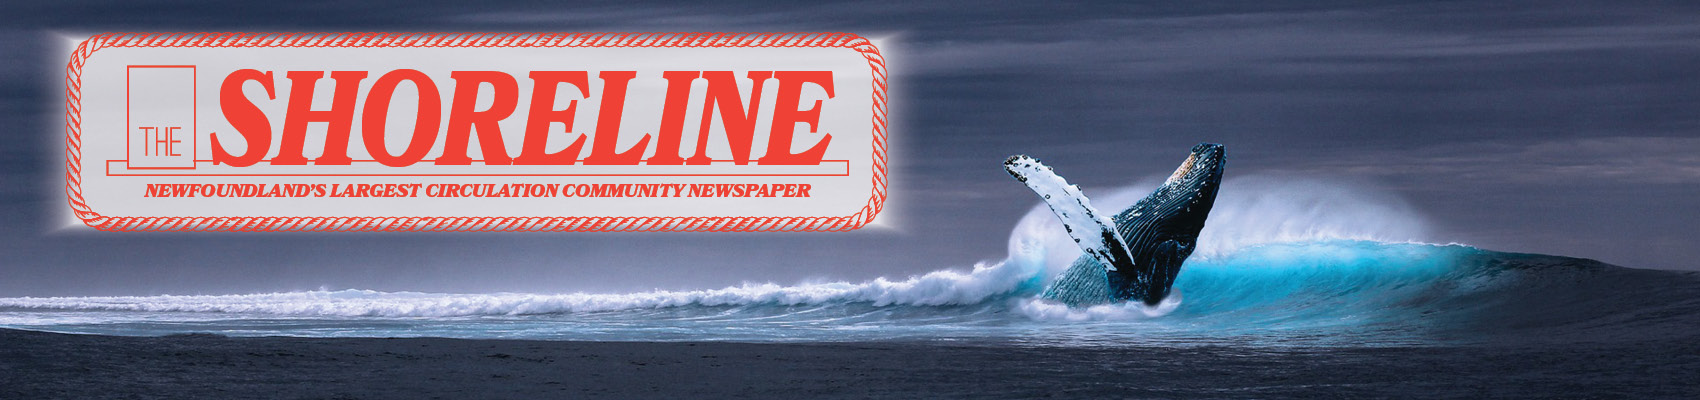 The Shoreline News